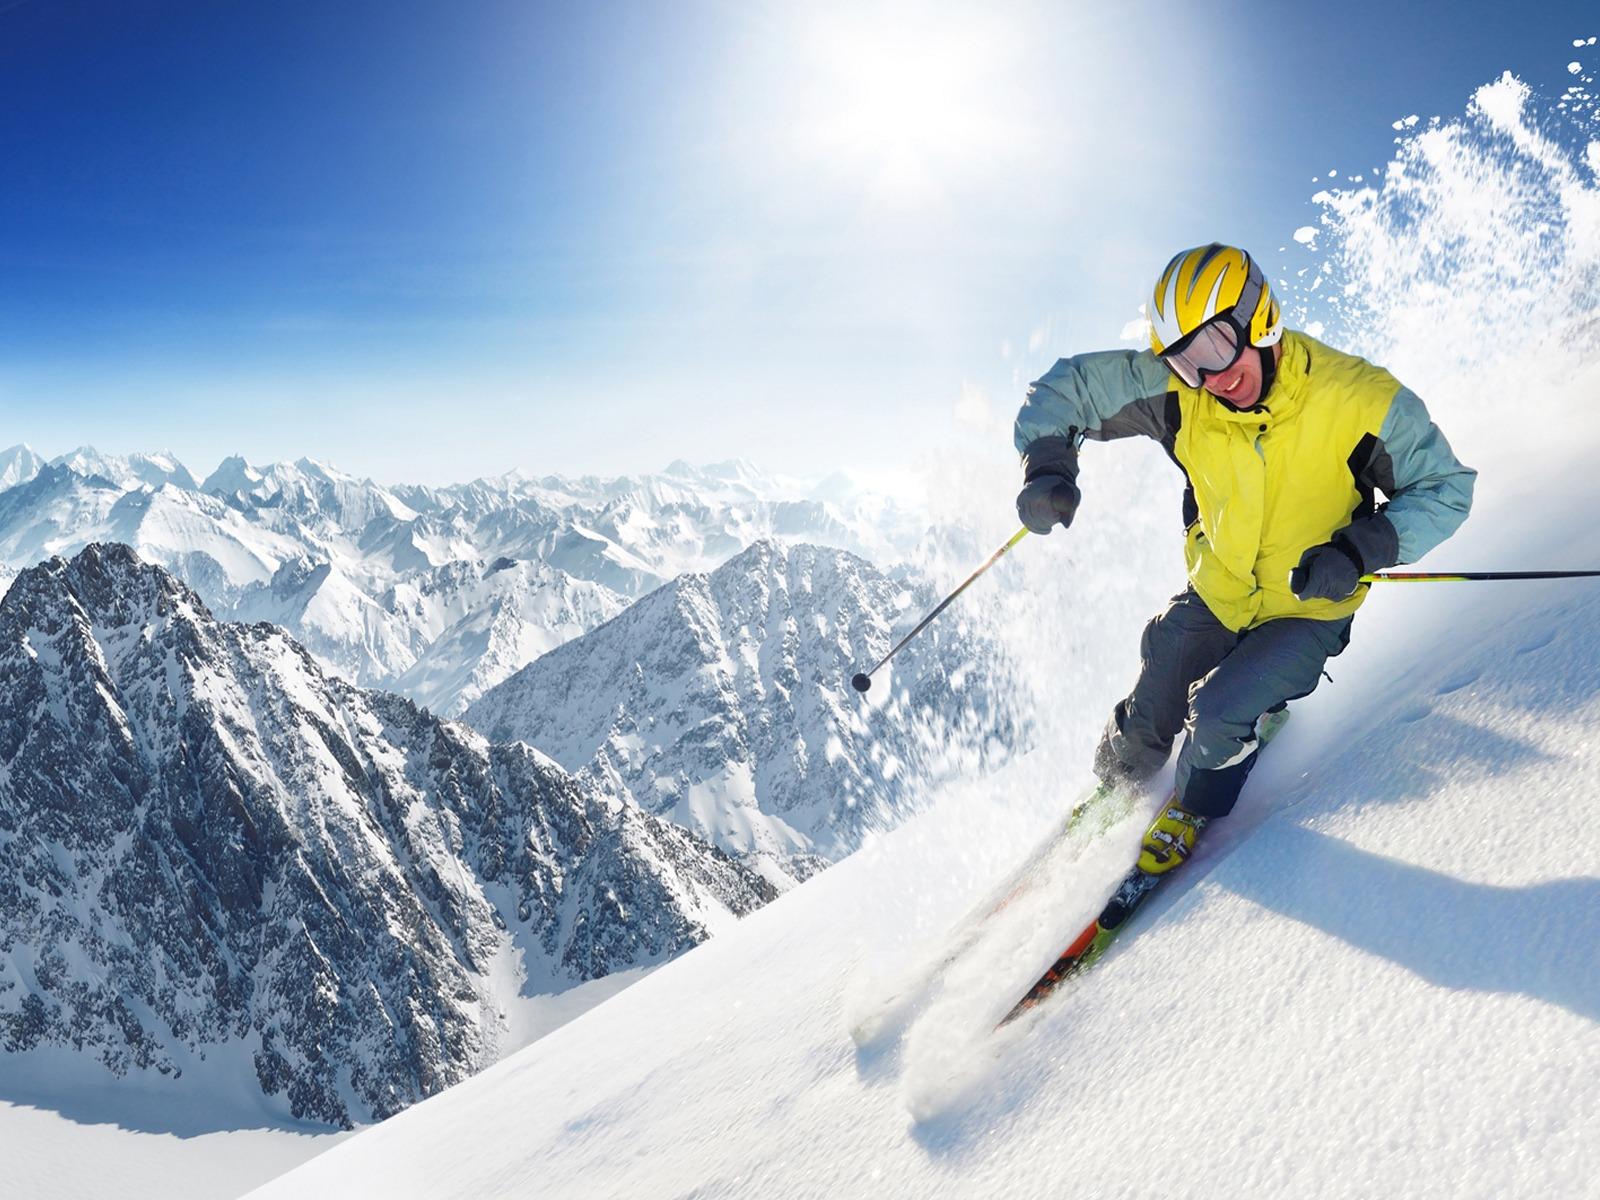 Extreme skiing wallpaper wallpapersafari - Ski wallpaper ...